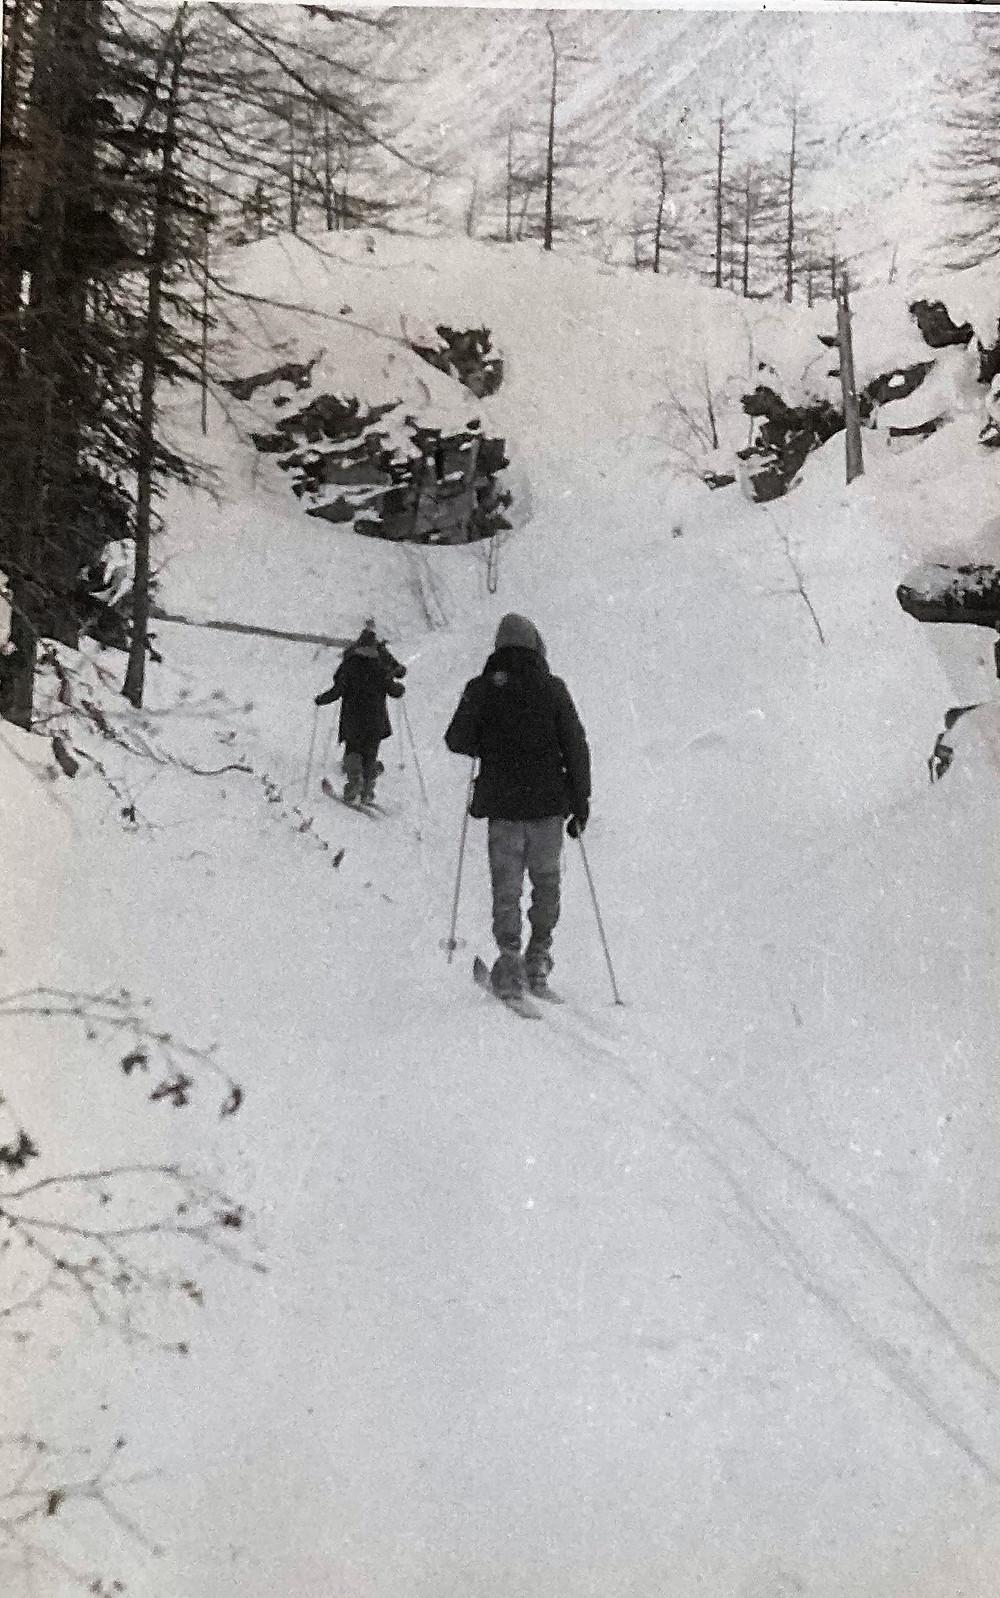 Река Олга| skitour.club| Блог Сергея Чеботова